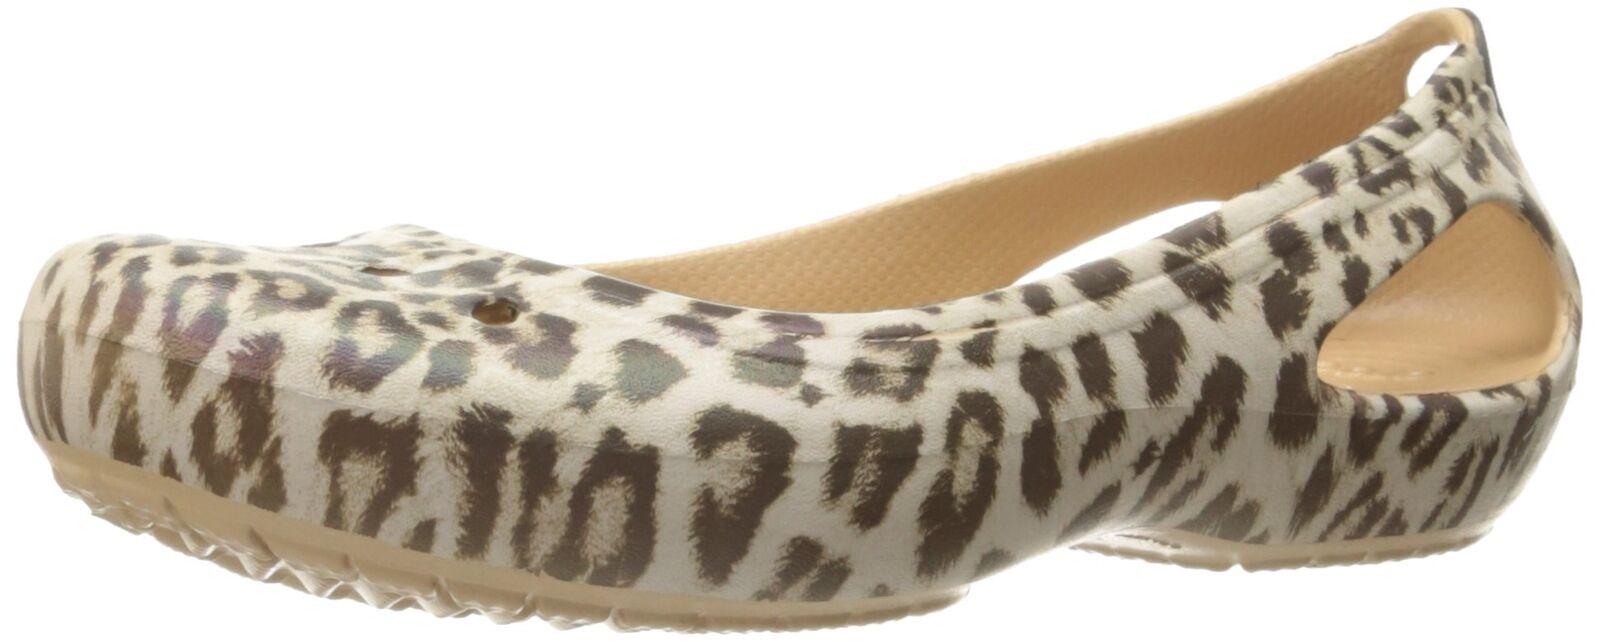 Crocs Women's Kadee Graphic Ballet Flat Leopard 4 M US